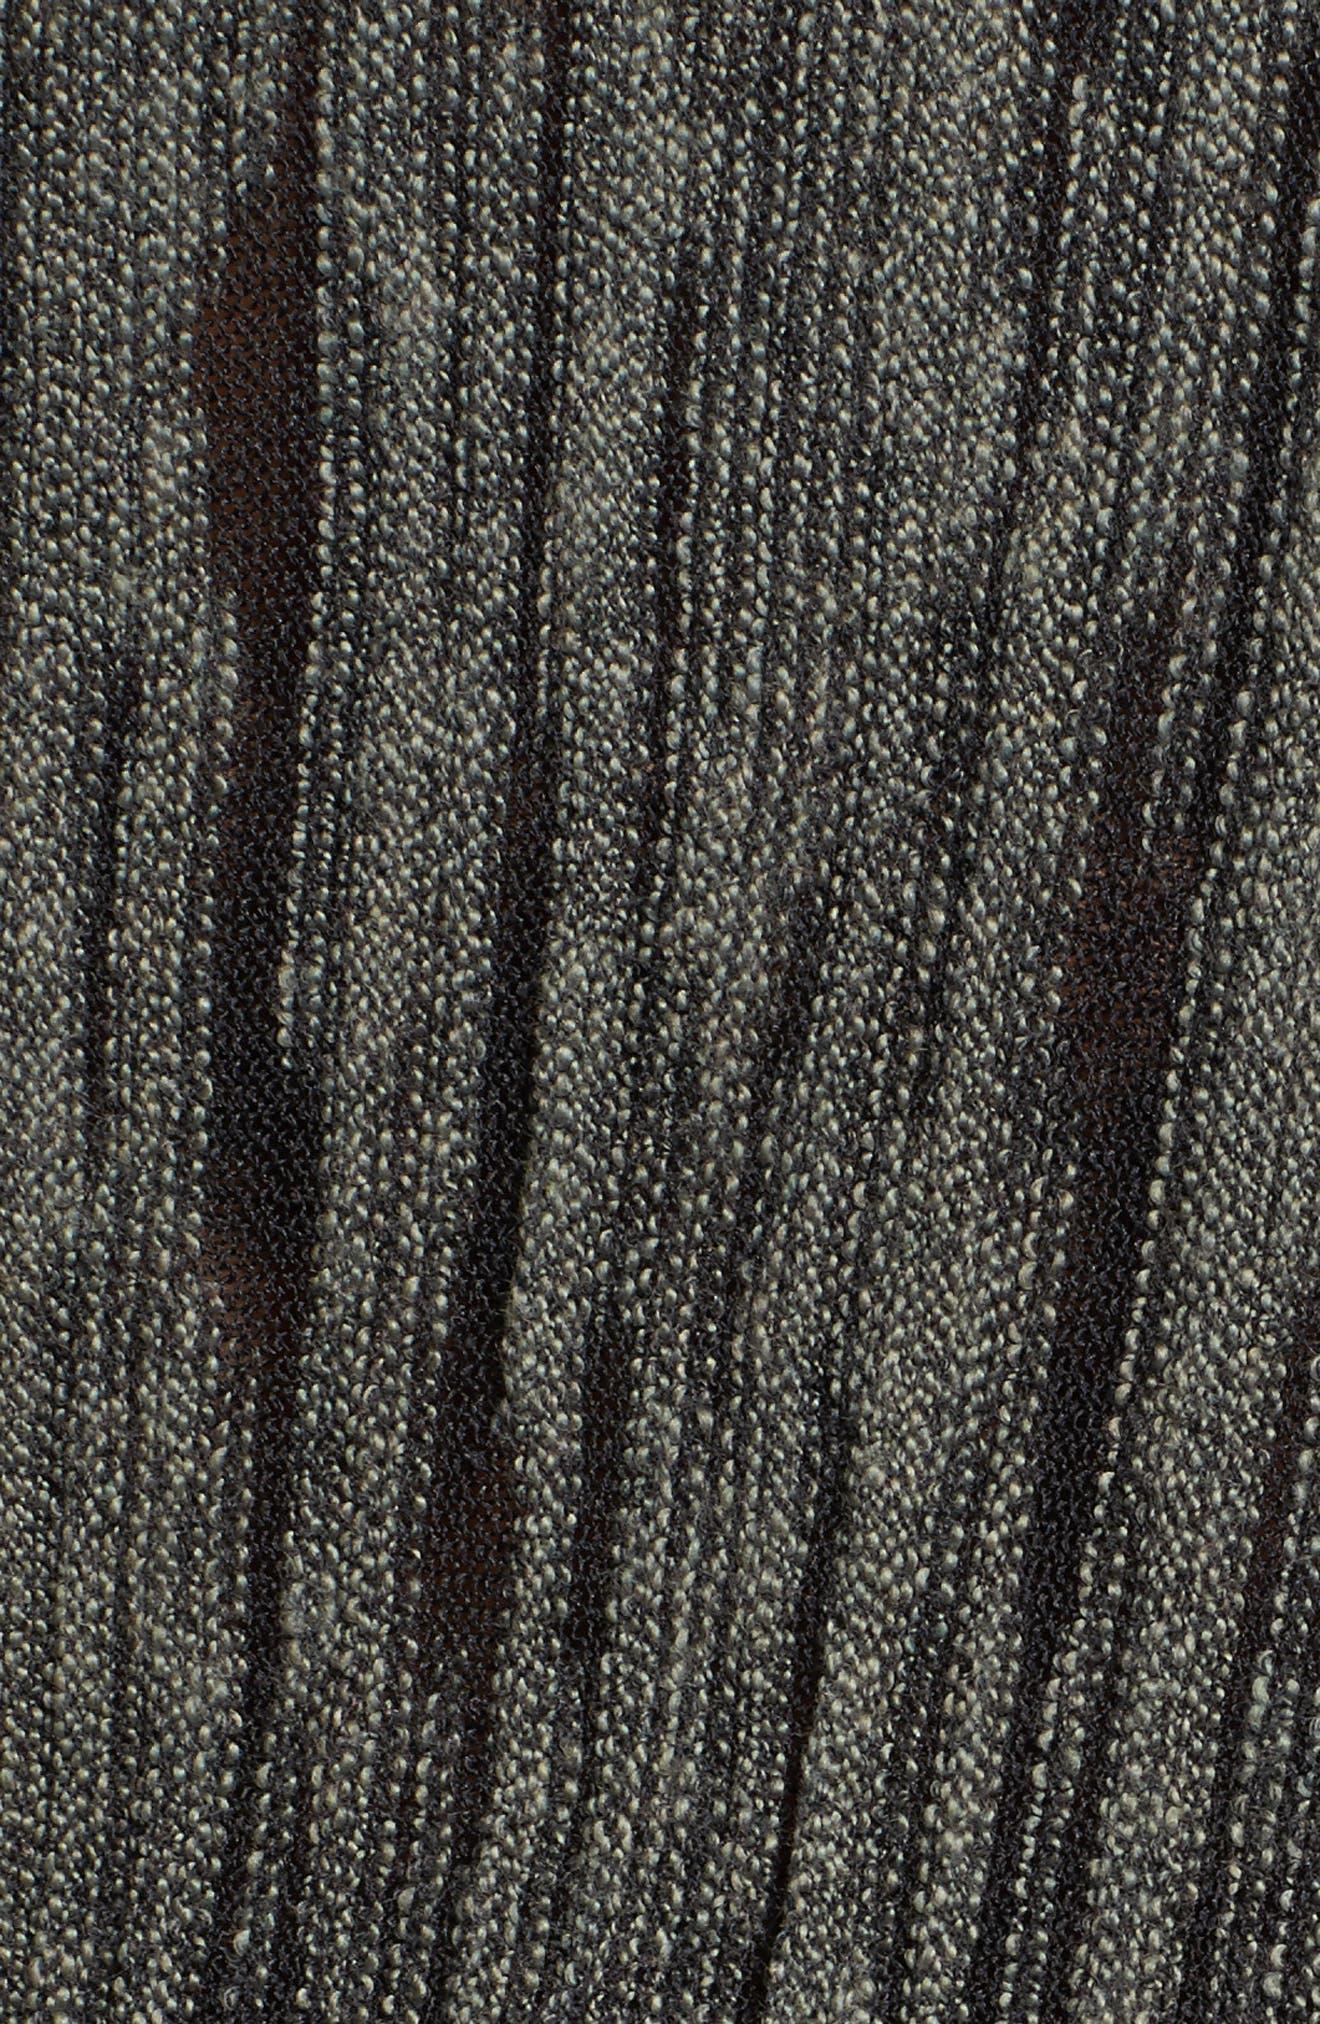 Cowl Neck Top,                             Alternate thumbnail 5, color,                             BRAMBLE